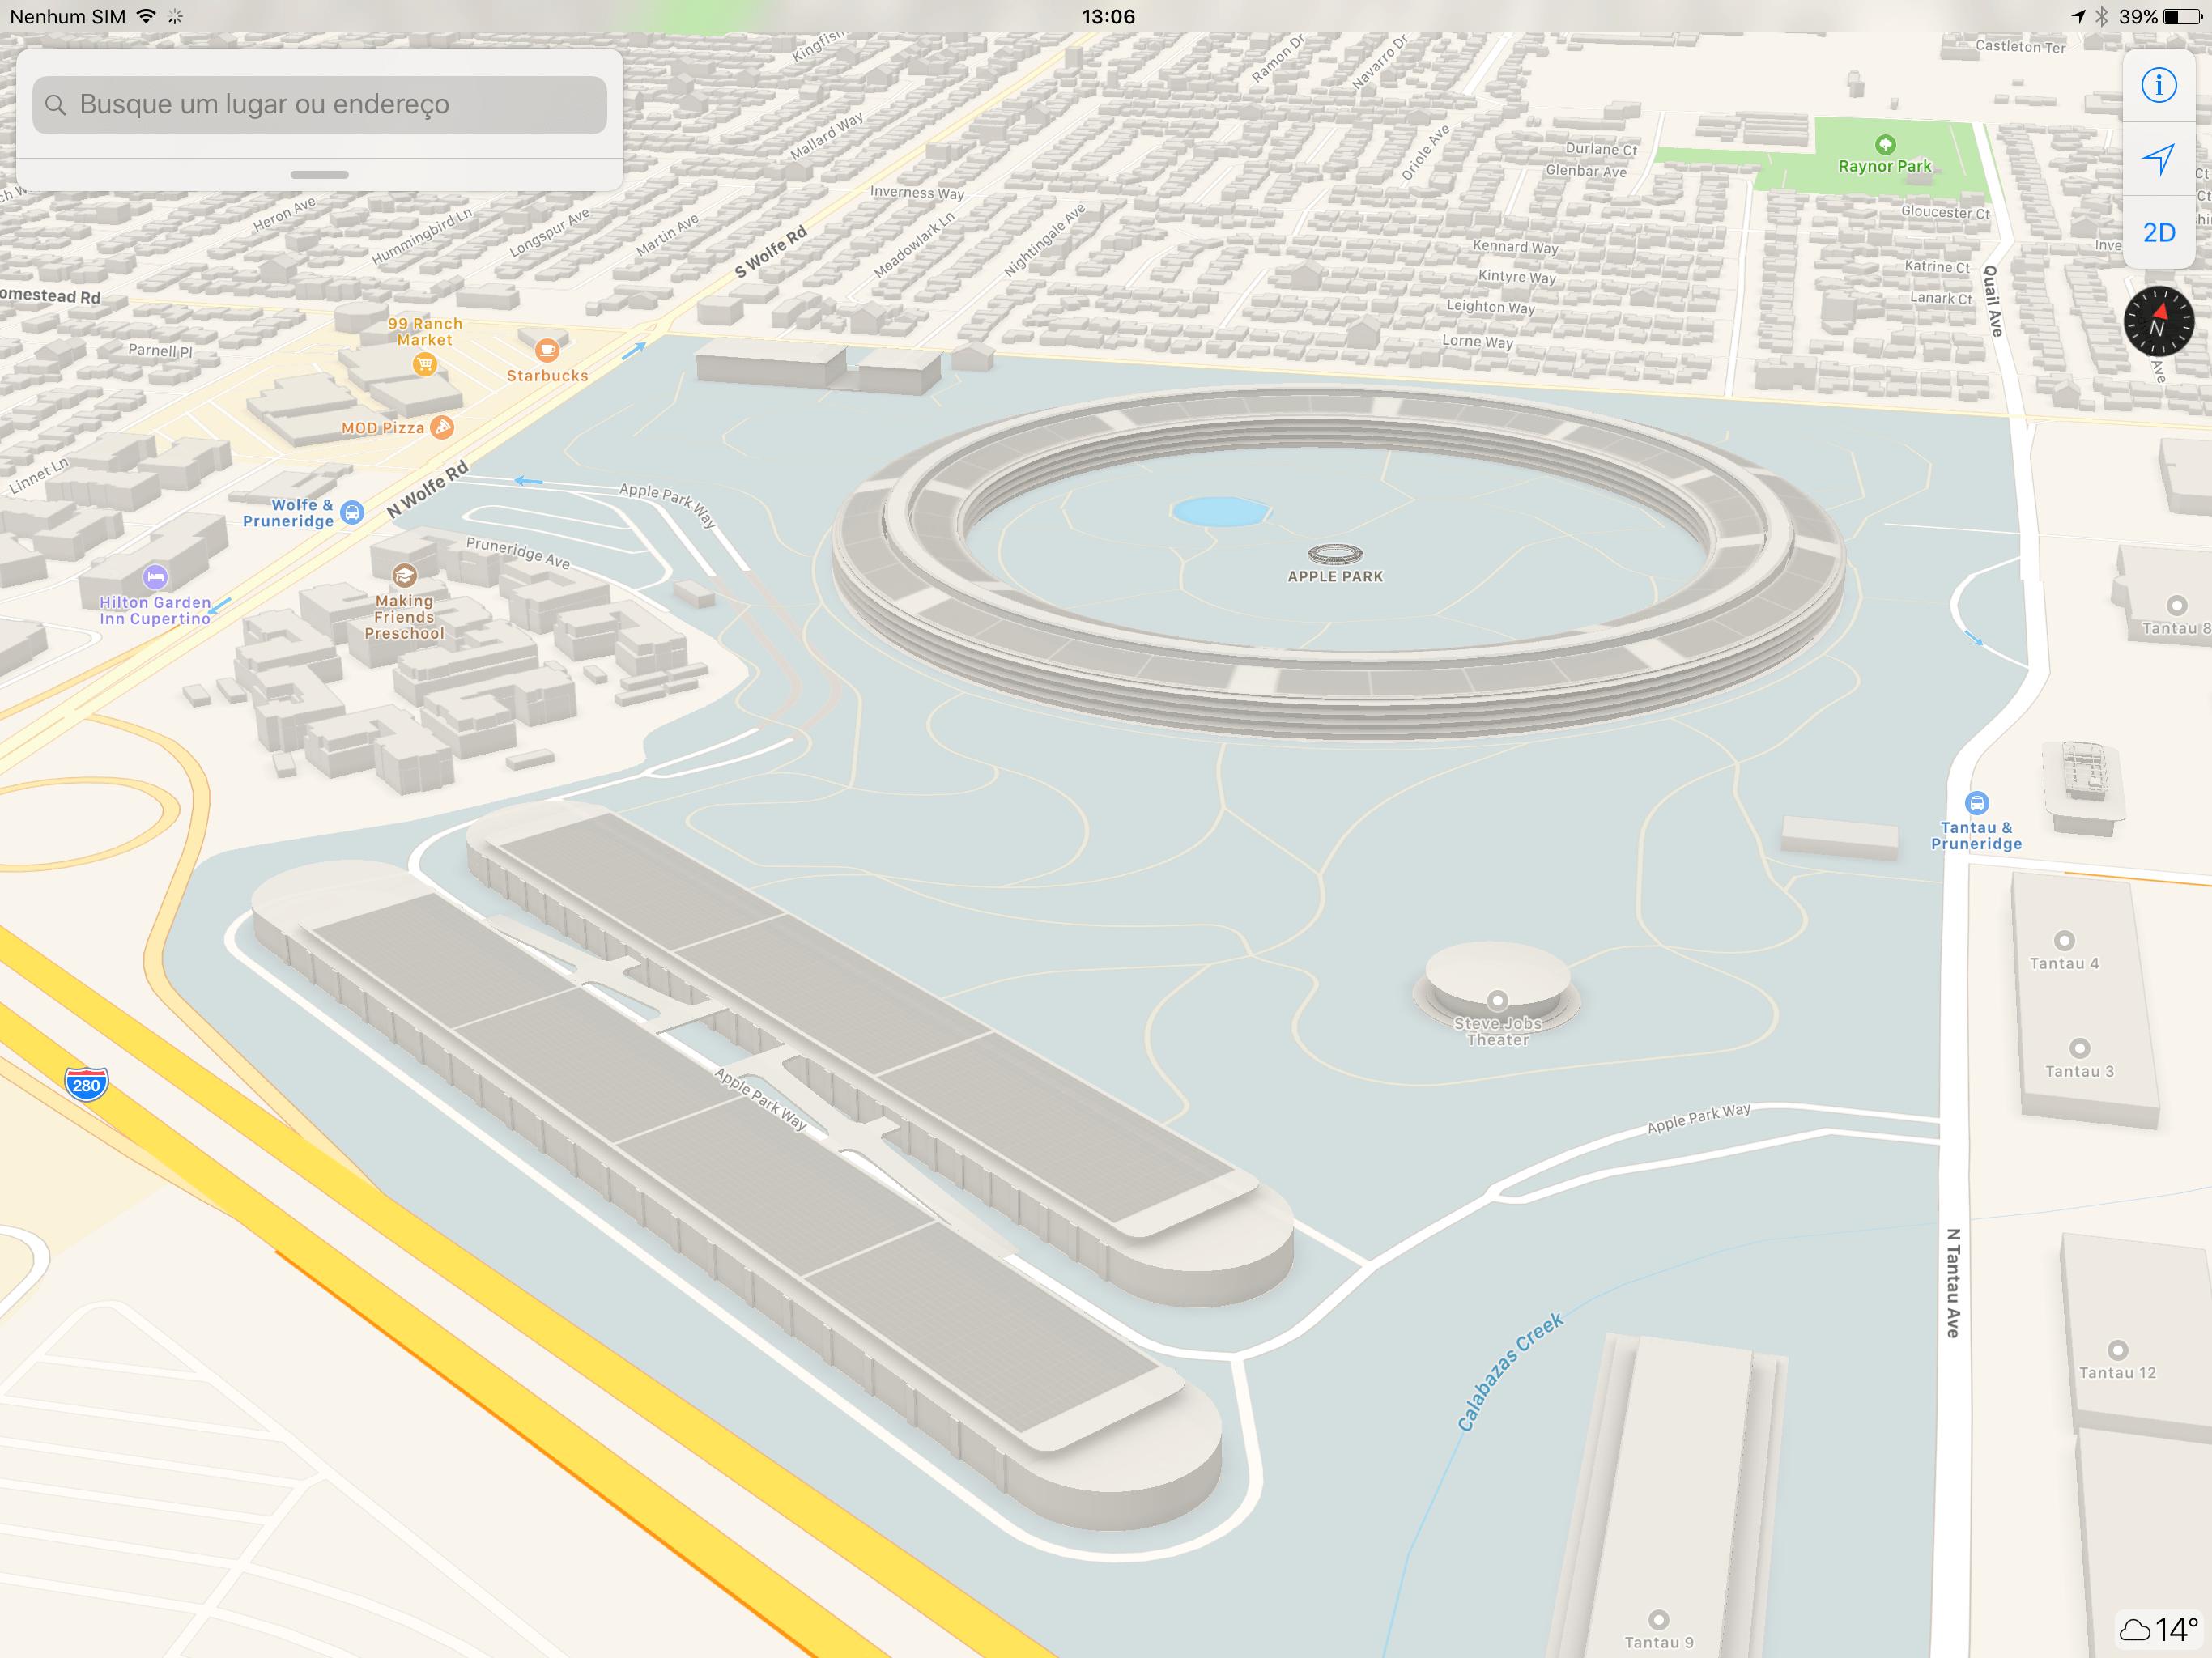 Apple Park em 3D no Maps